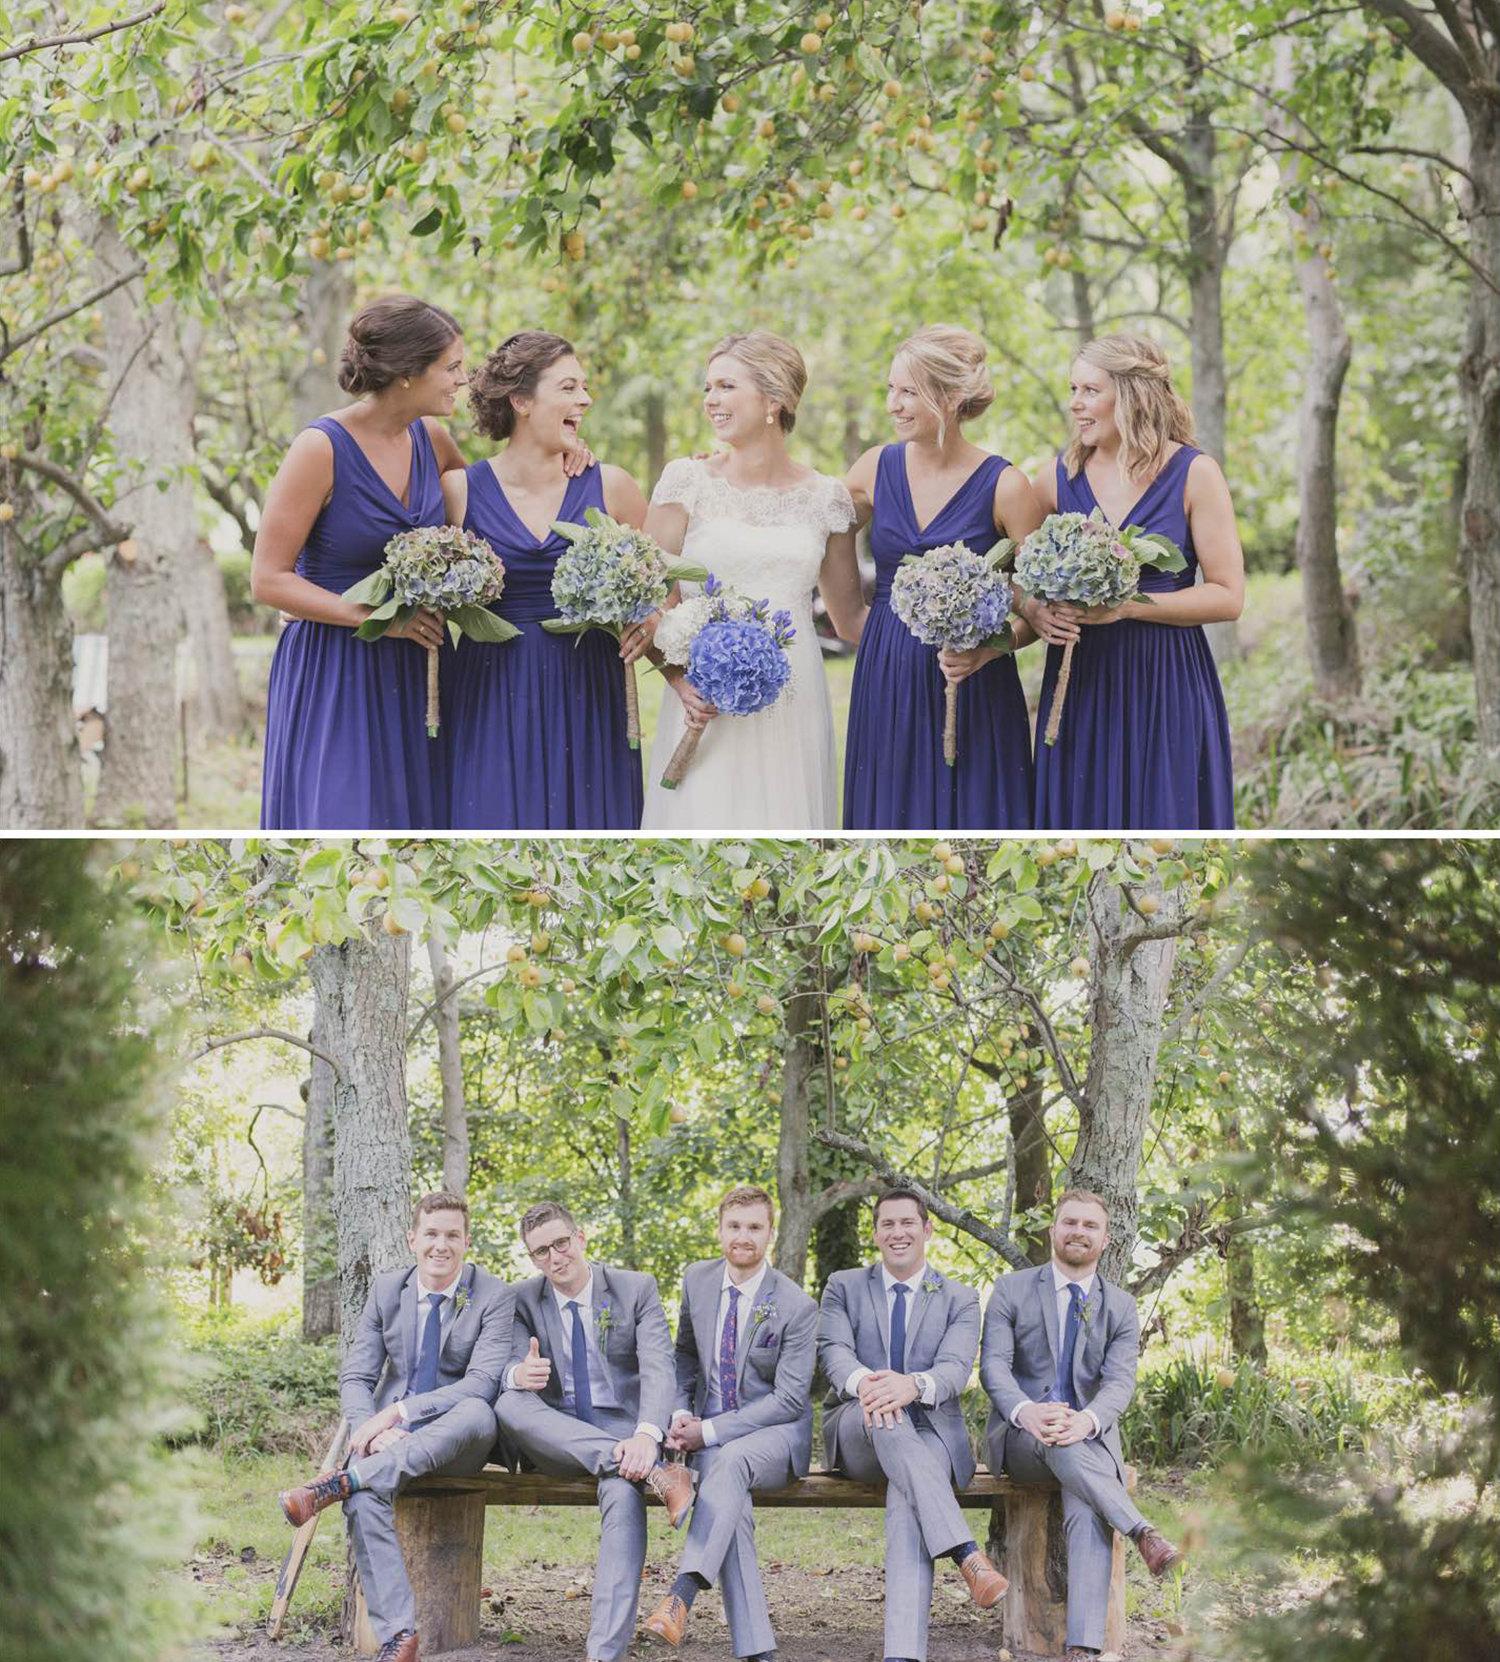 Hawkes-Bay-wedding-siaosi-photography11.JPG